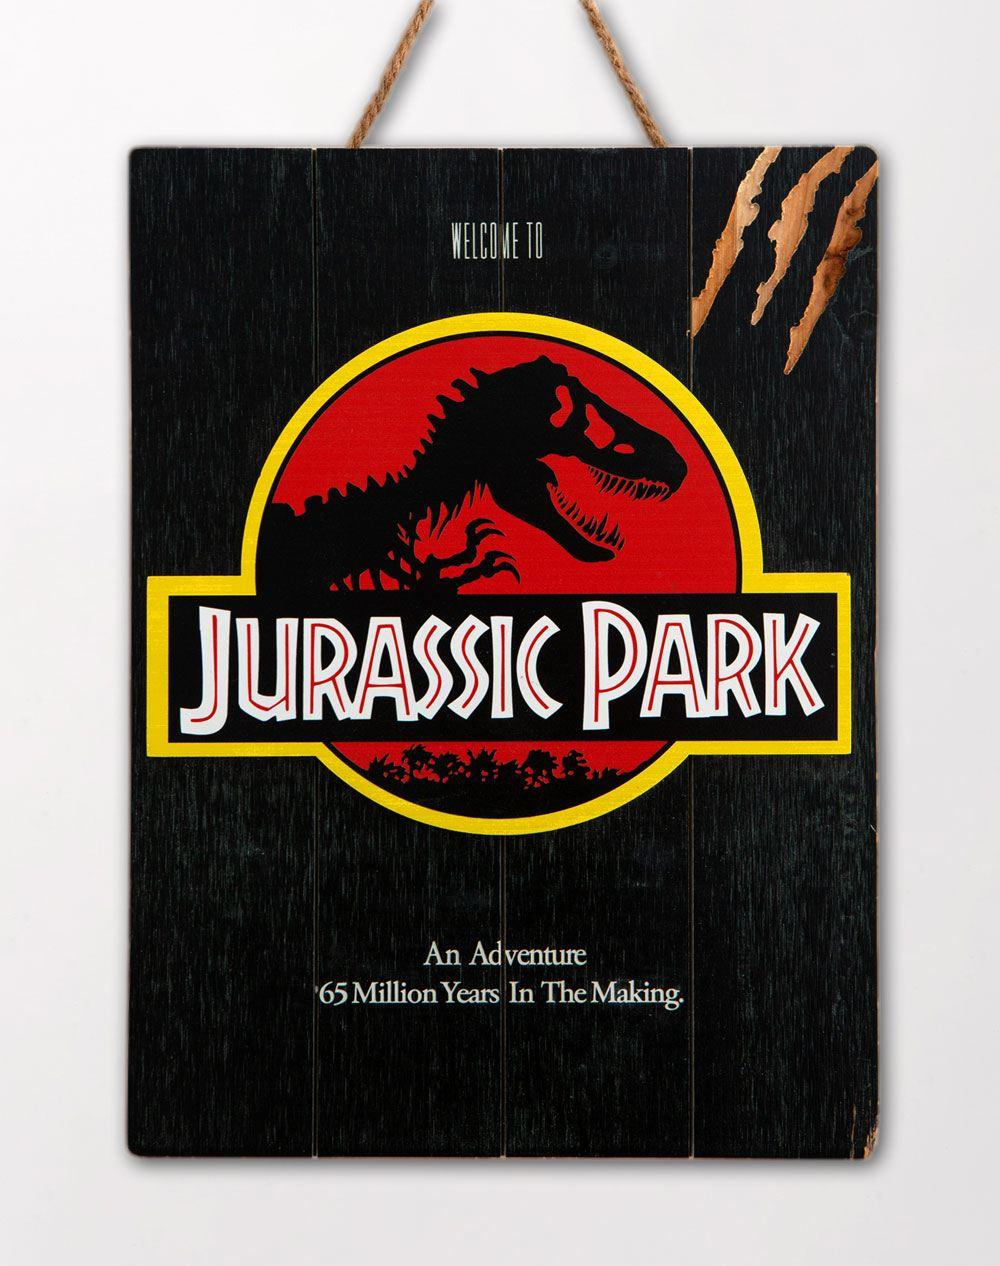 Jurassic park tableau en bois woodarts 3d logo print 6